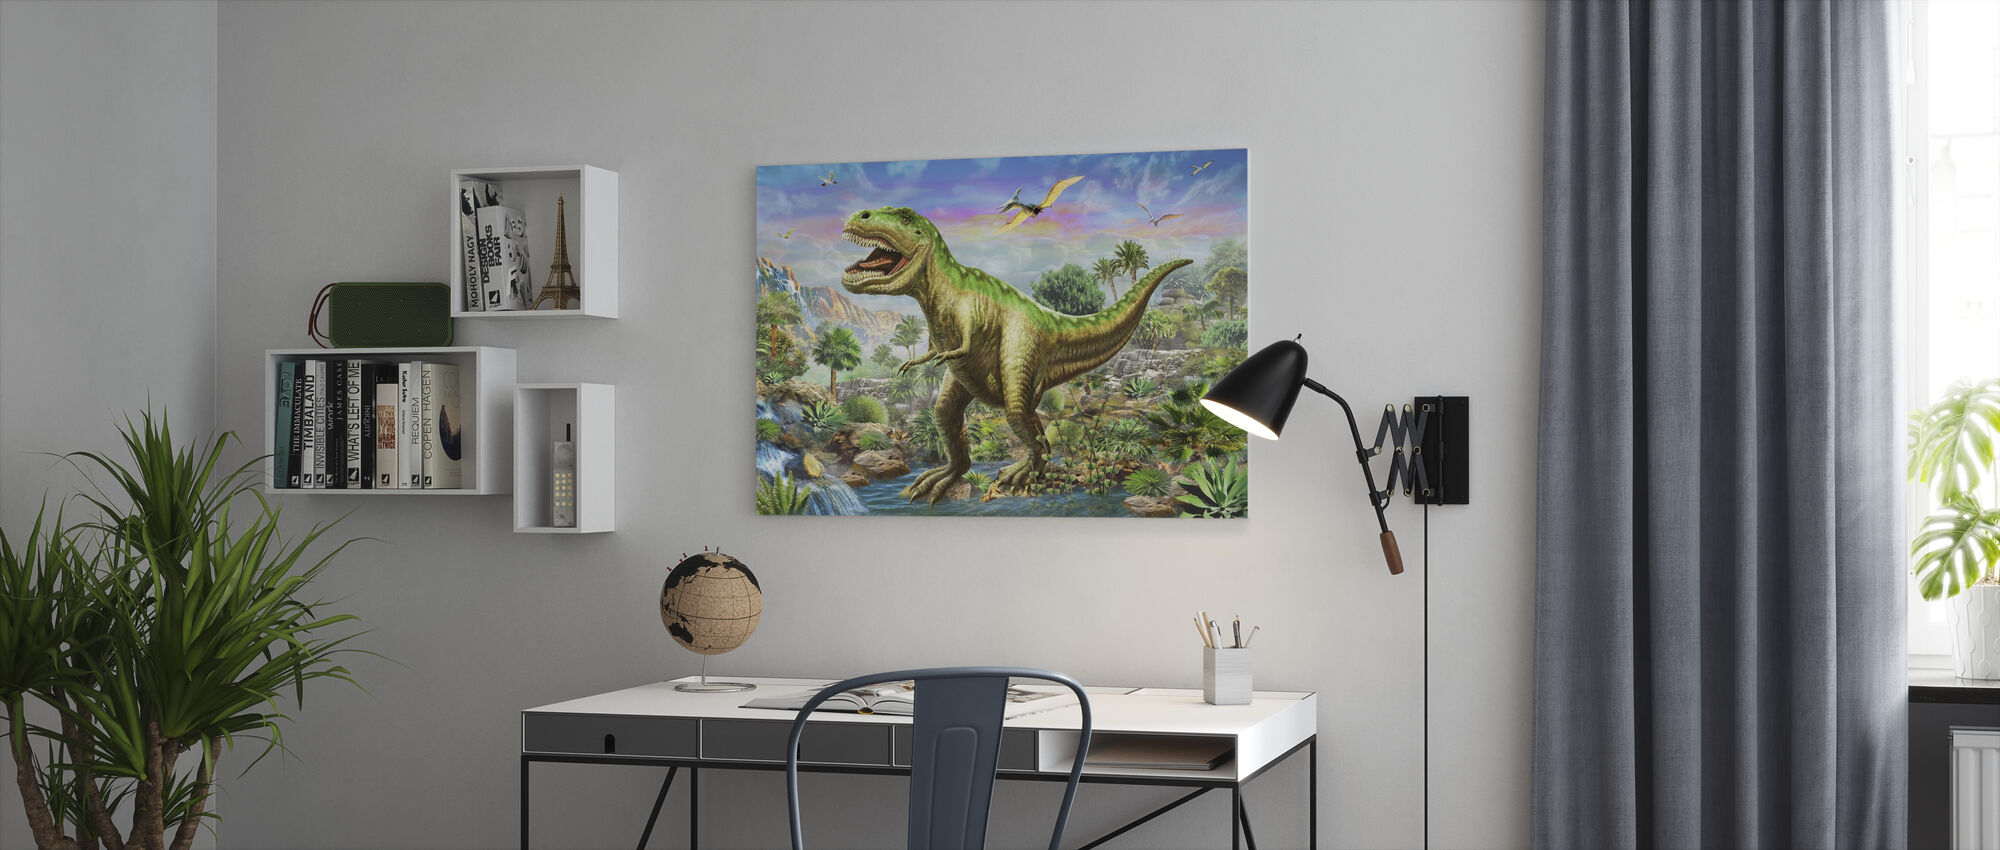 Tyranosaur 3 - Canvas print - Office